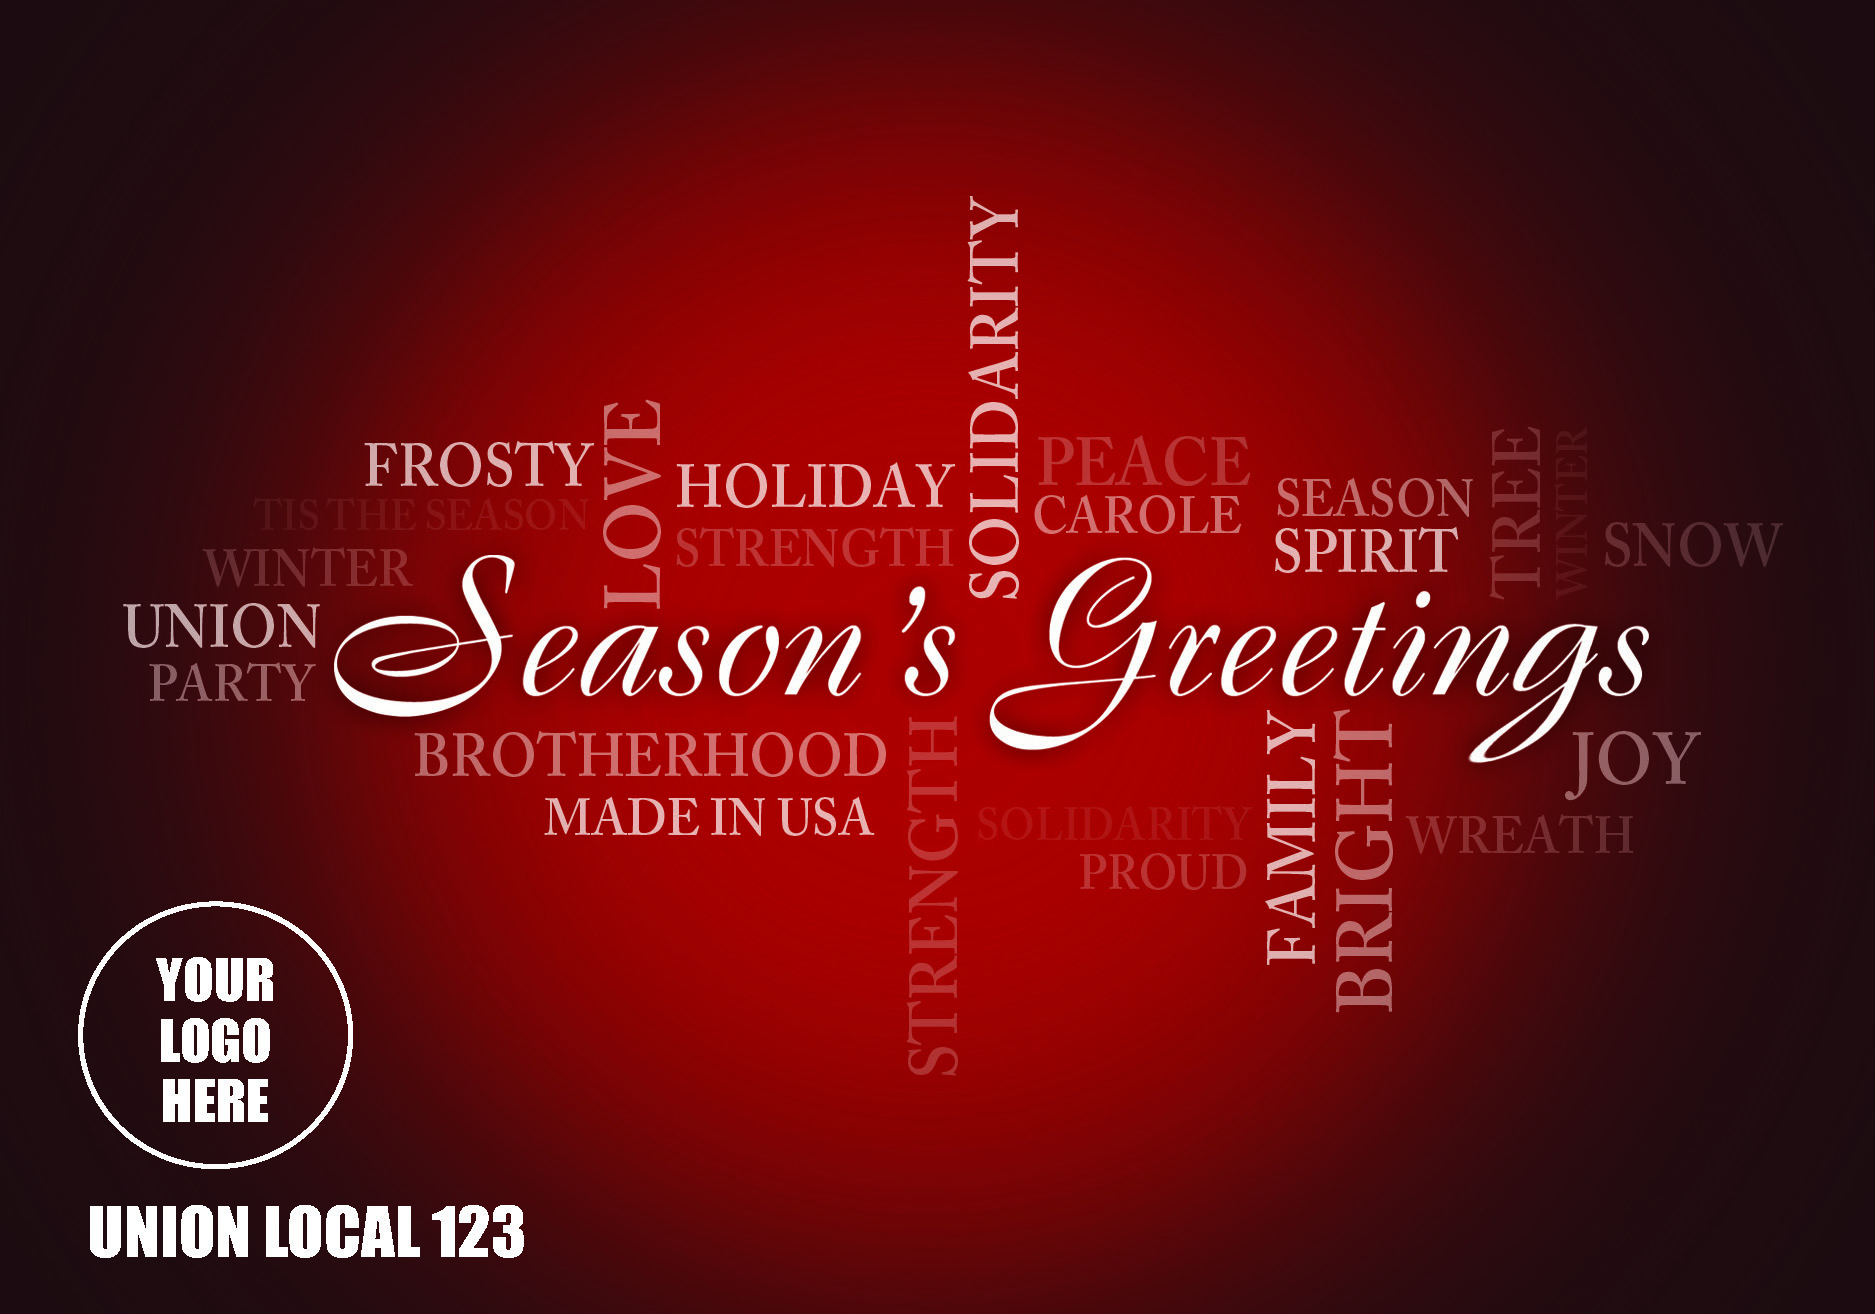 Season's Greeting Red